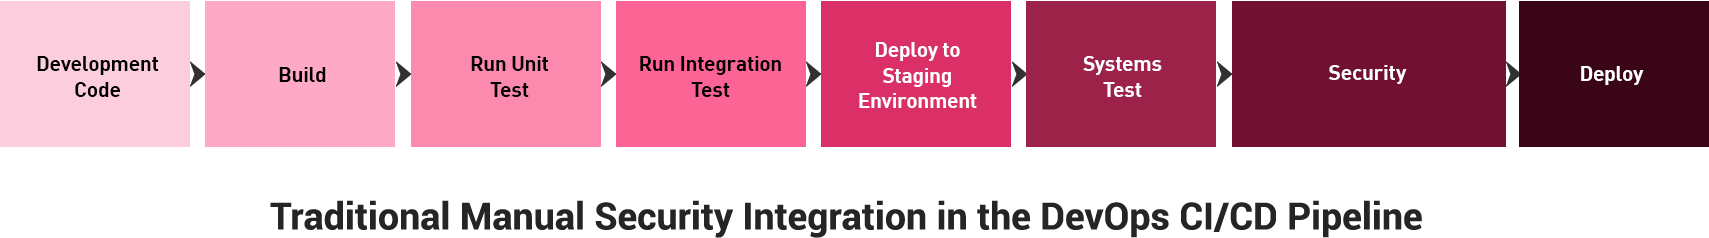 Manual Security Integration in the DevOps CI/CD Pipeline